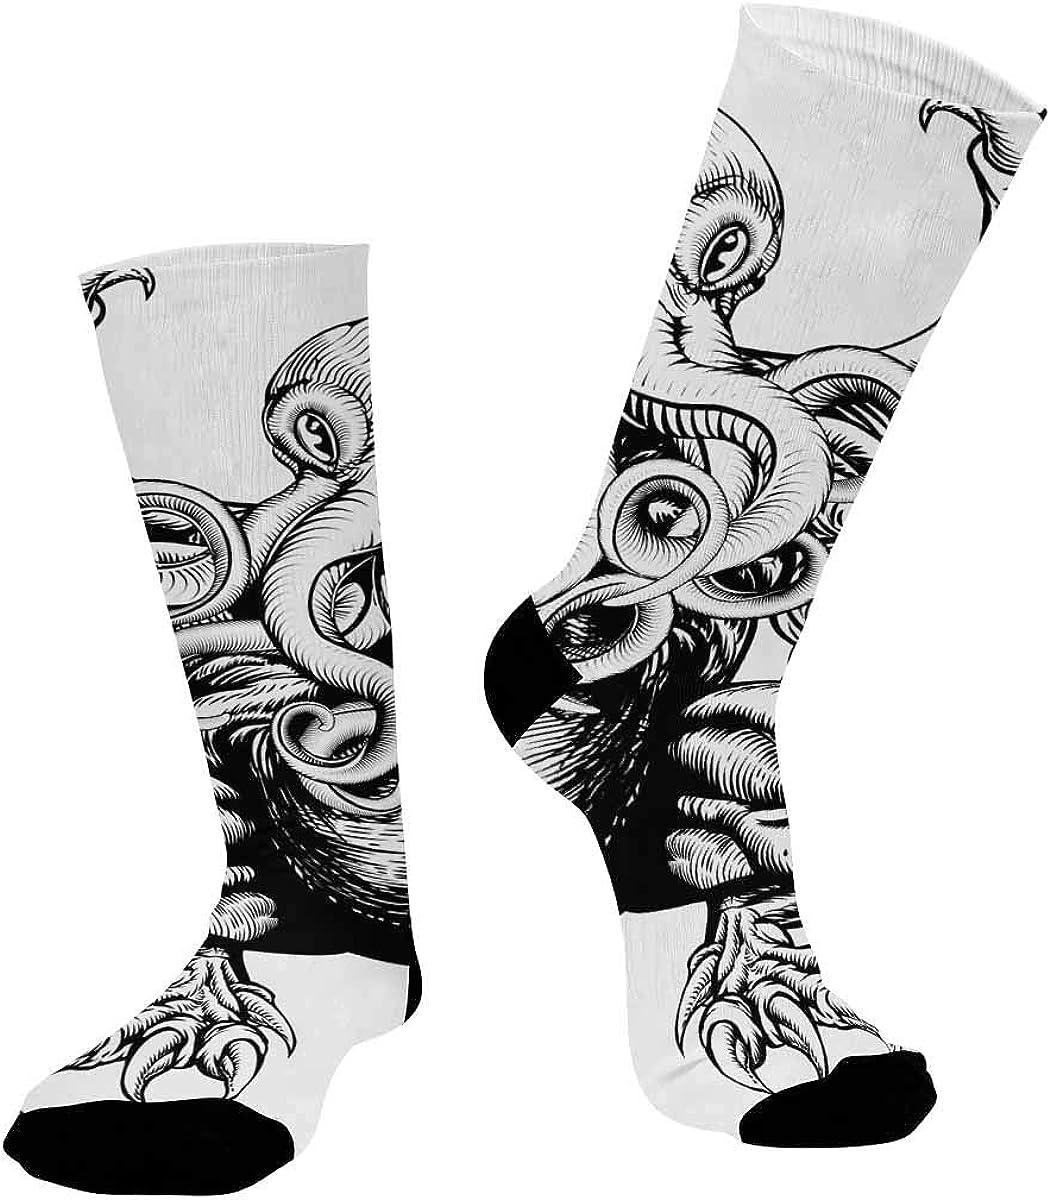 INTERESTPRINT Unisex Outdoor Sports Athletic Hiking Socks Cthulhu Monster